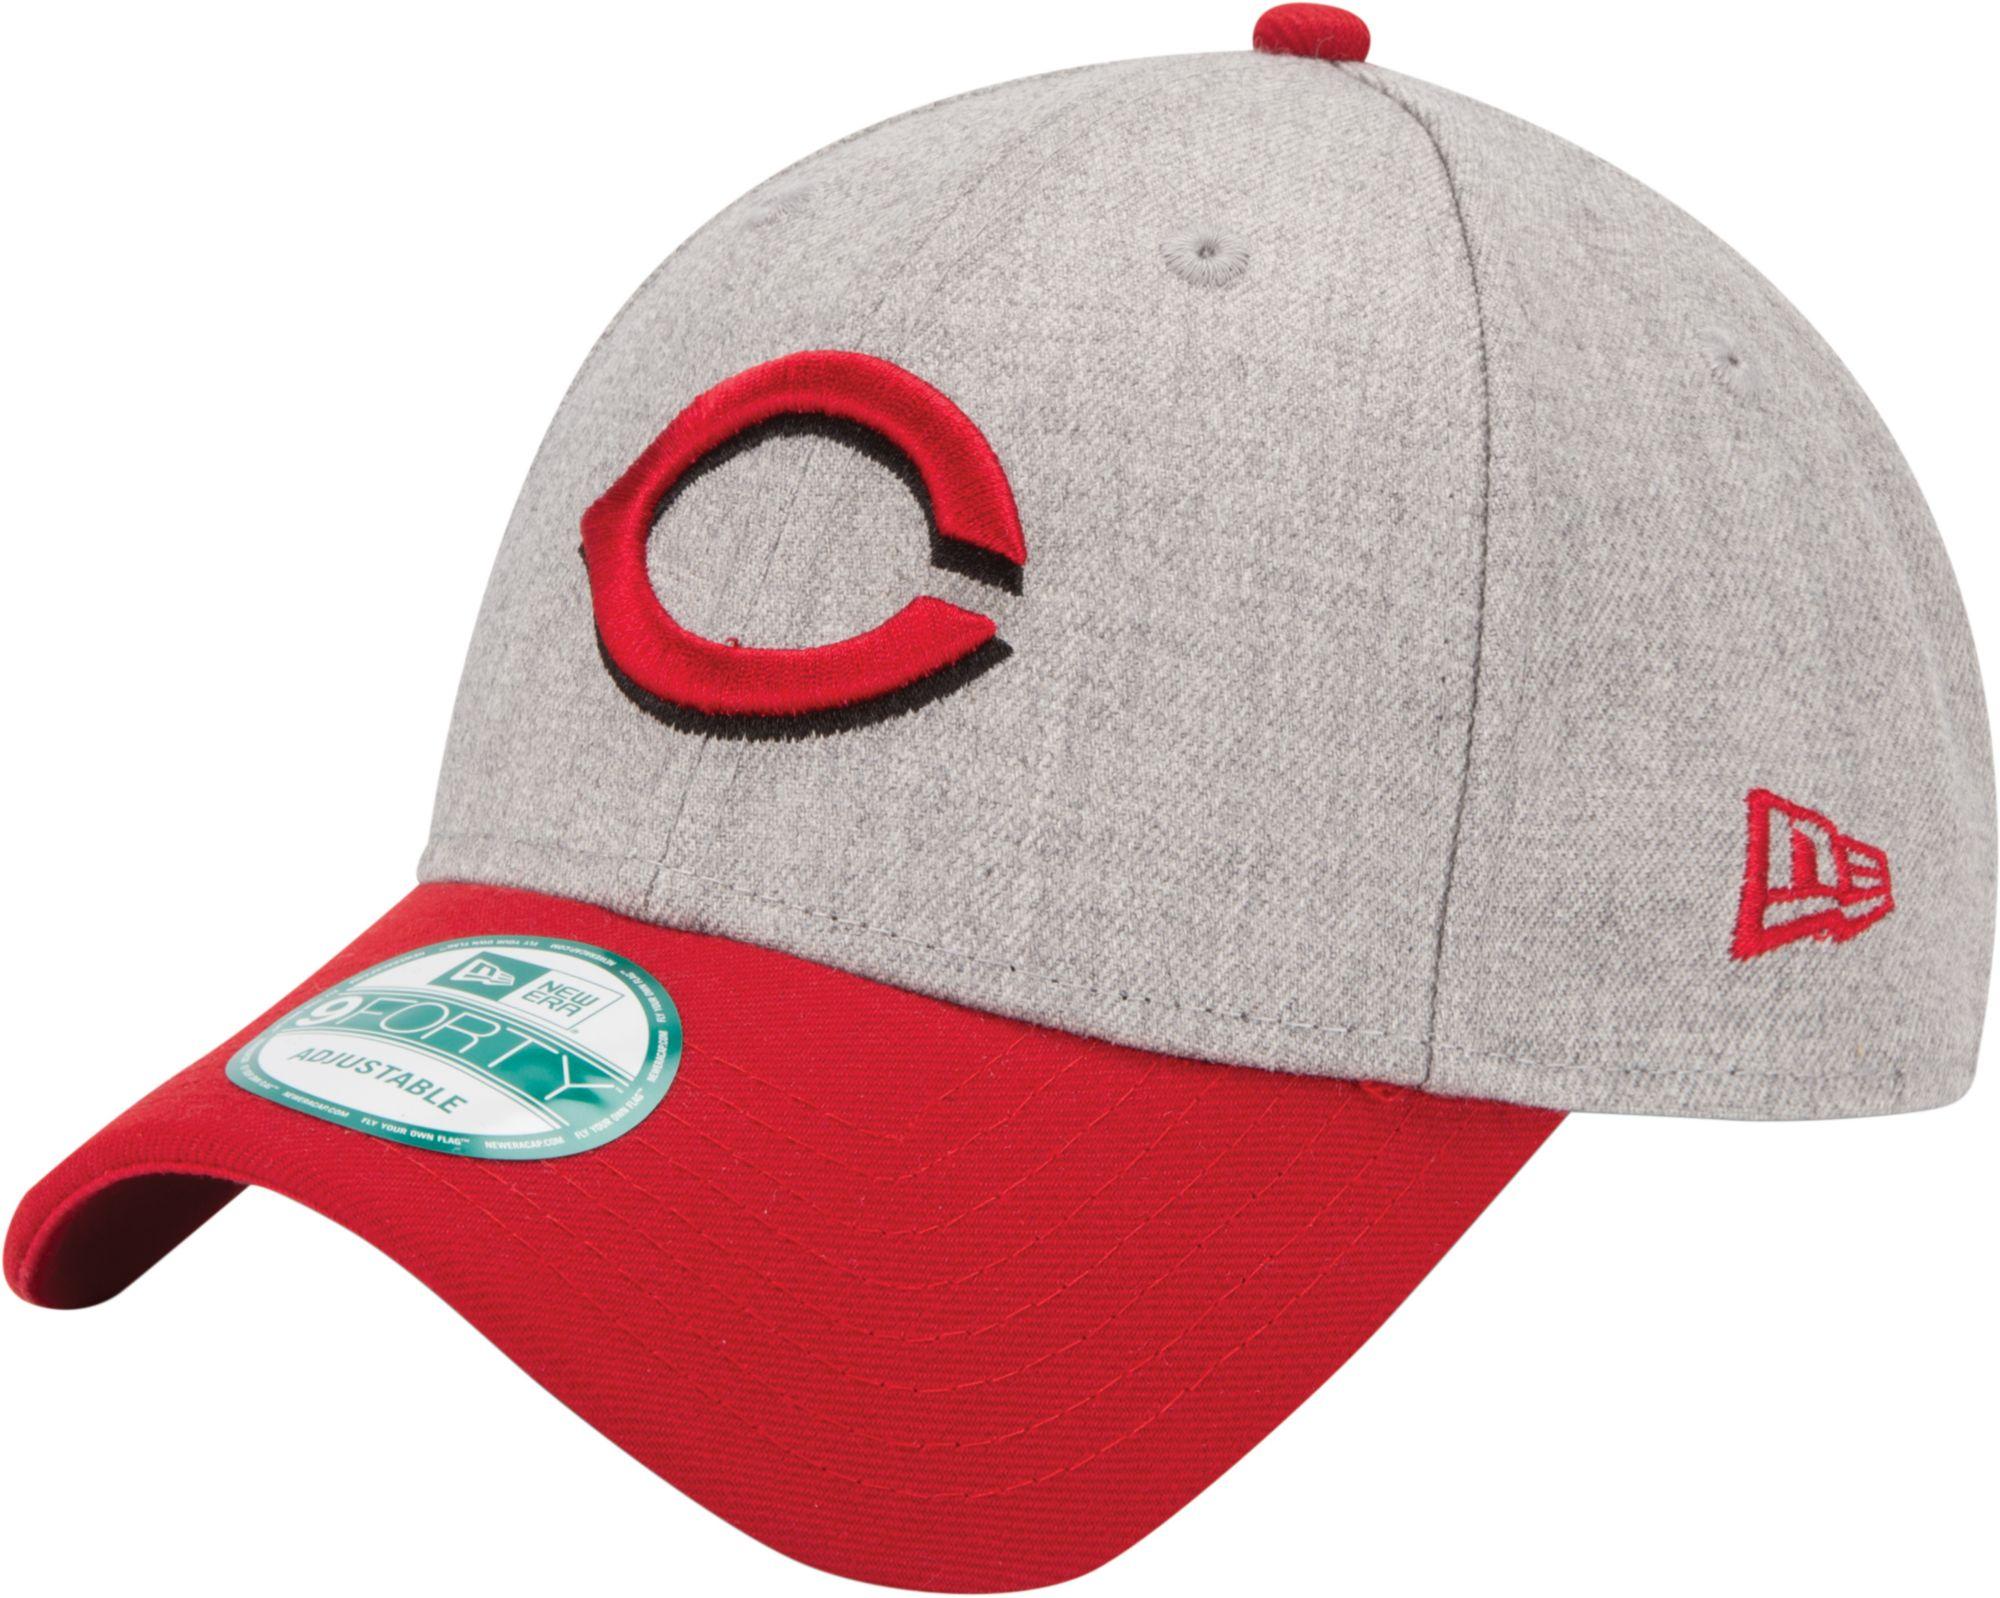 watch b1436 f9365 ... coupon new era mens cincinnati reds 9forty grey adjustable hat f5d39  7172b